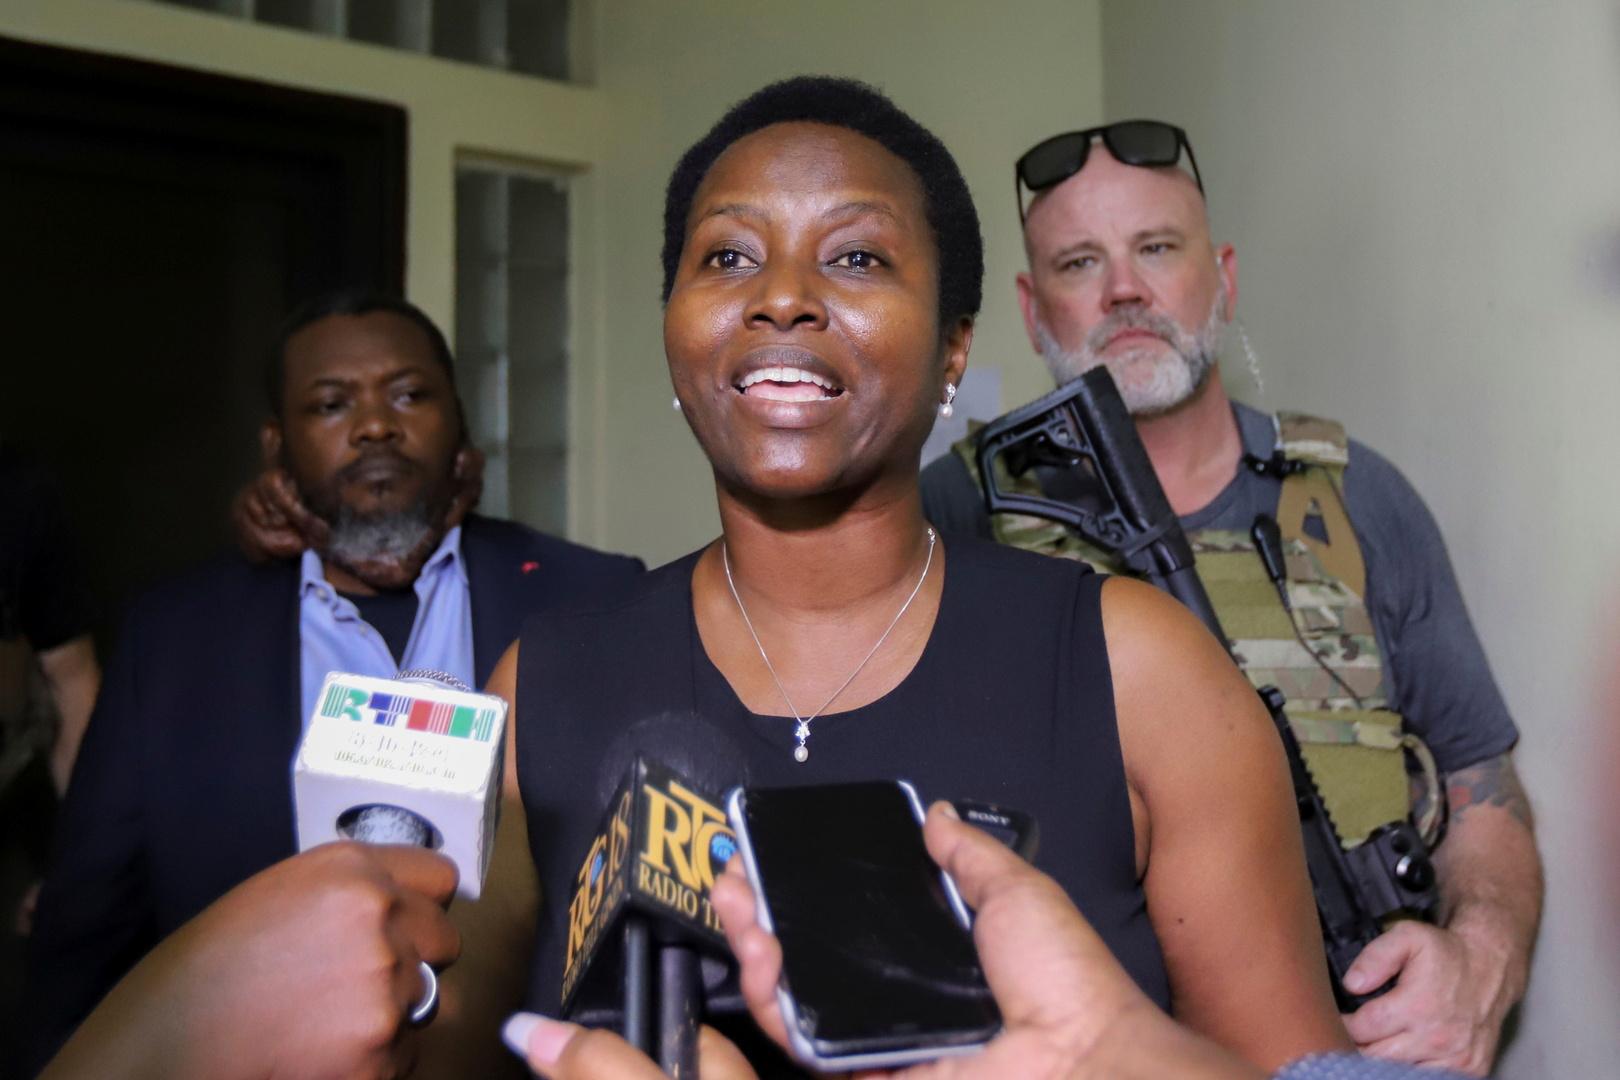 مارتين مويز، أرملة رئيس هايتي جوفينيل مويز